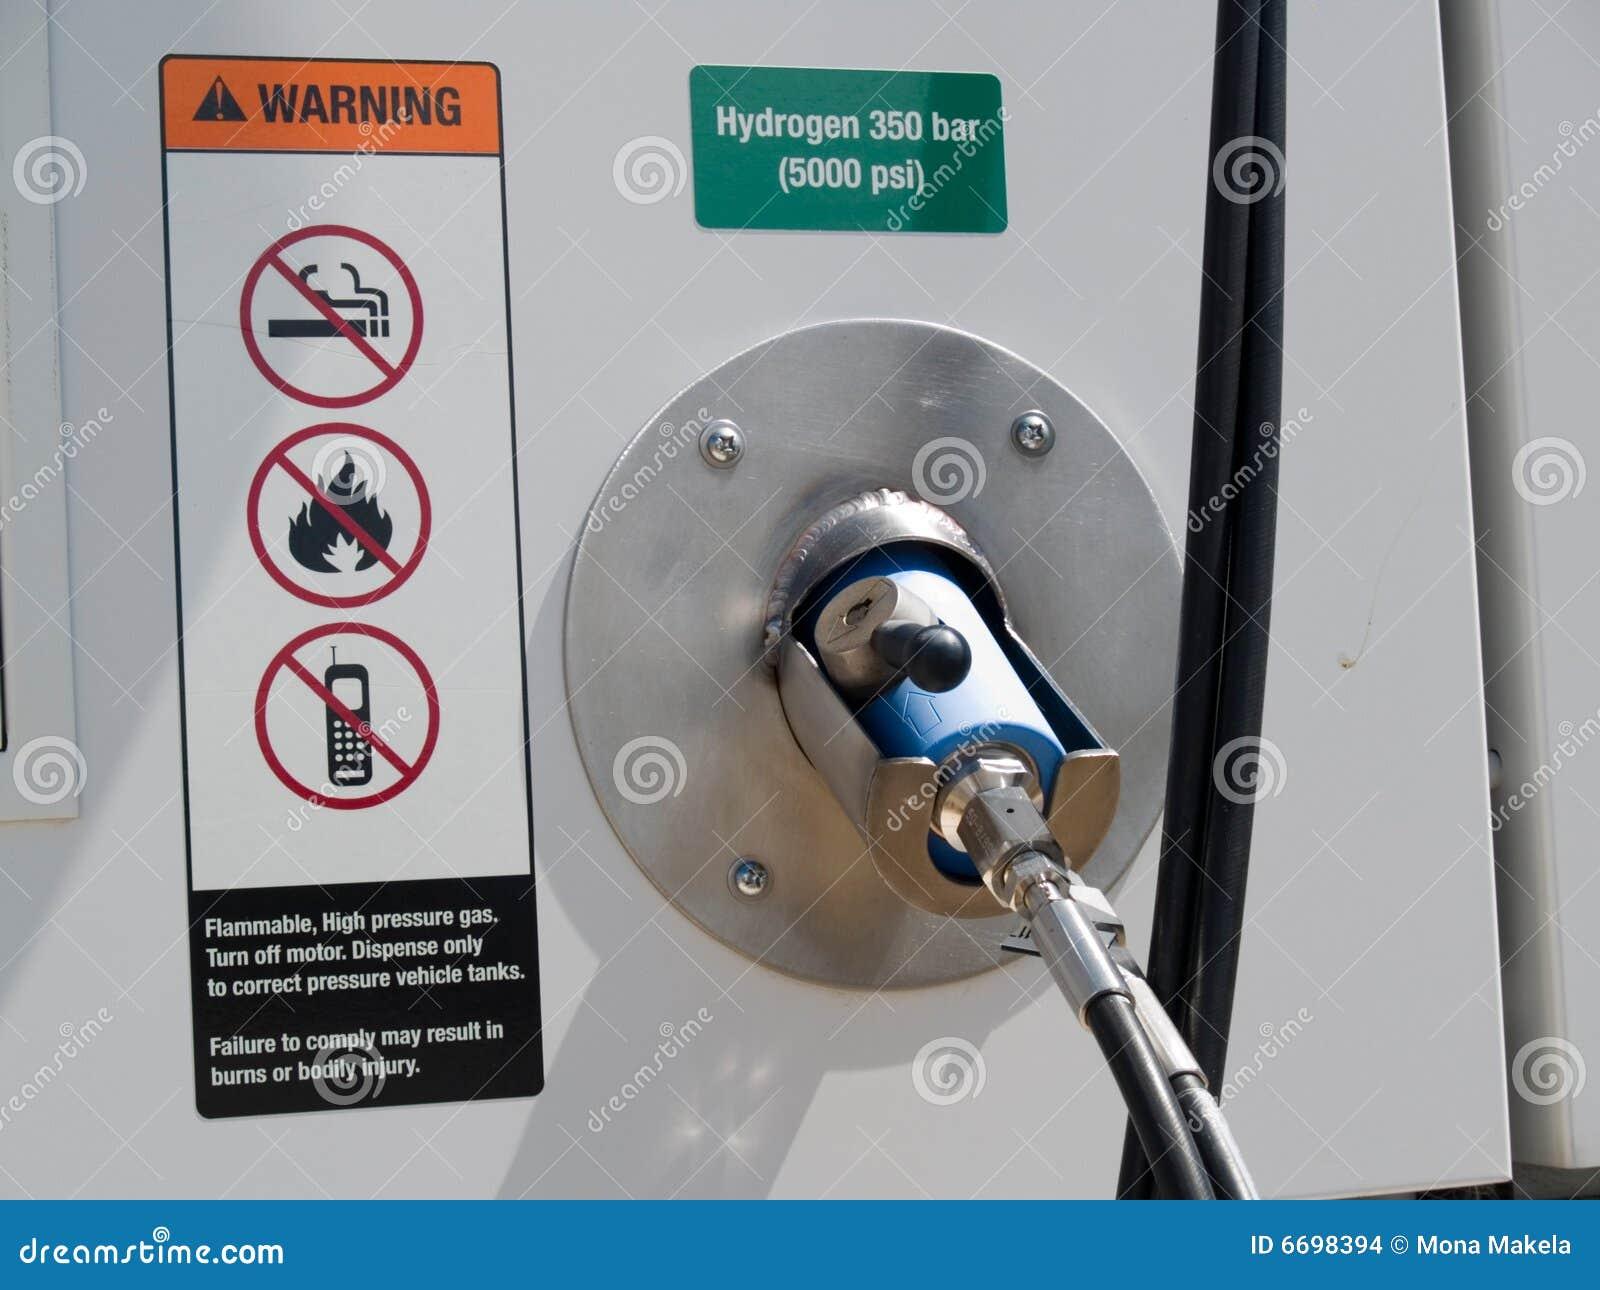 Hydrogen fuel dispenser for vehicles